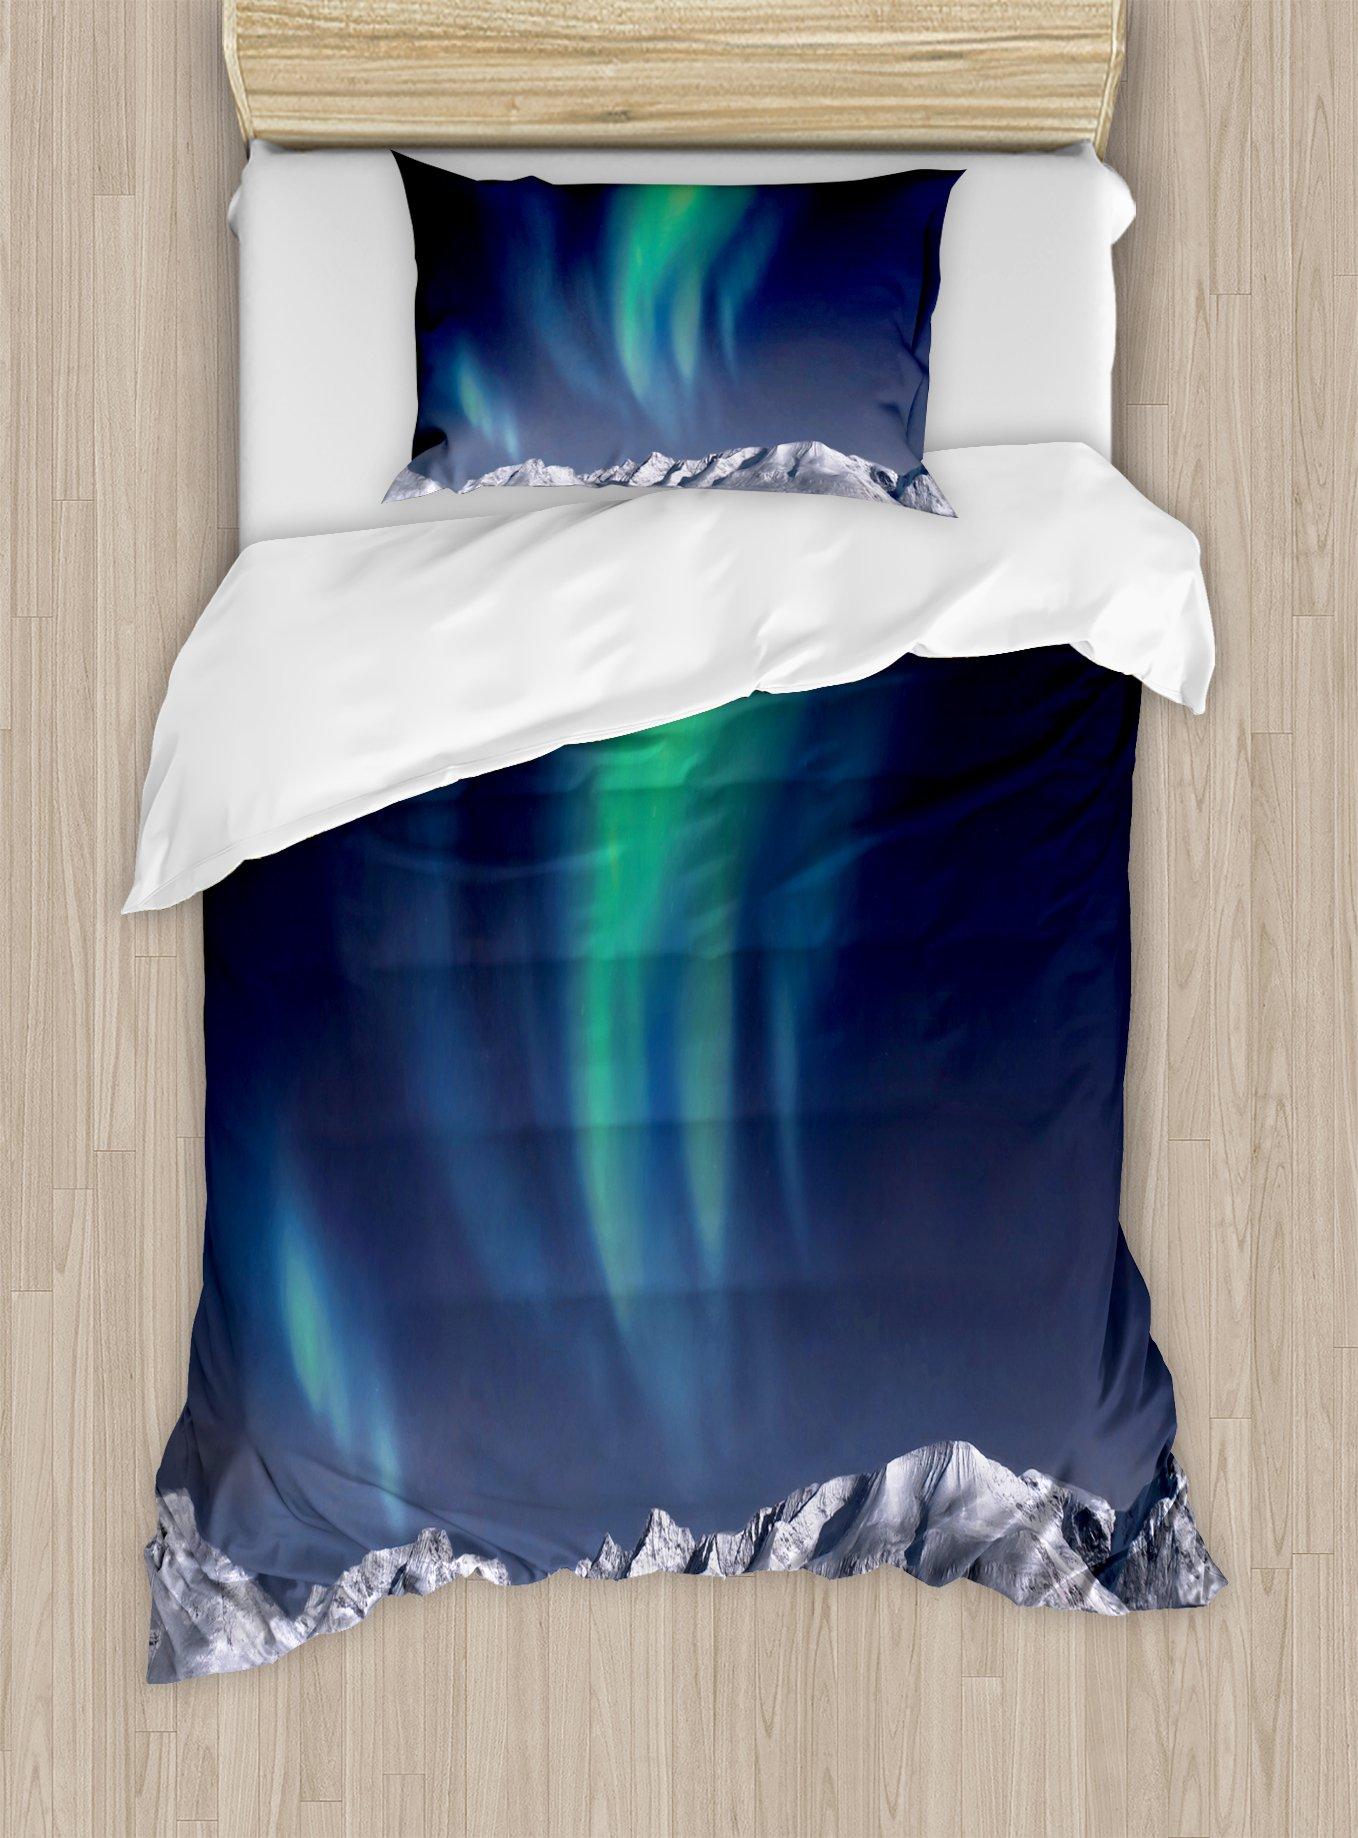 Ambesonne Sky Duvet Cover Set Twin Size, Aurora Borealis Aurora Over Fjords Mountain at Night Norway Solar Image Artwork, Decorative 2 Piece Bedding Set with 1 Pillow Sham, Green Dark Blue